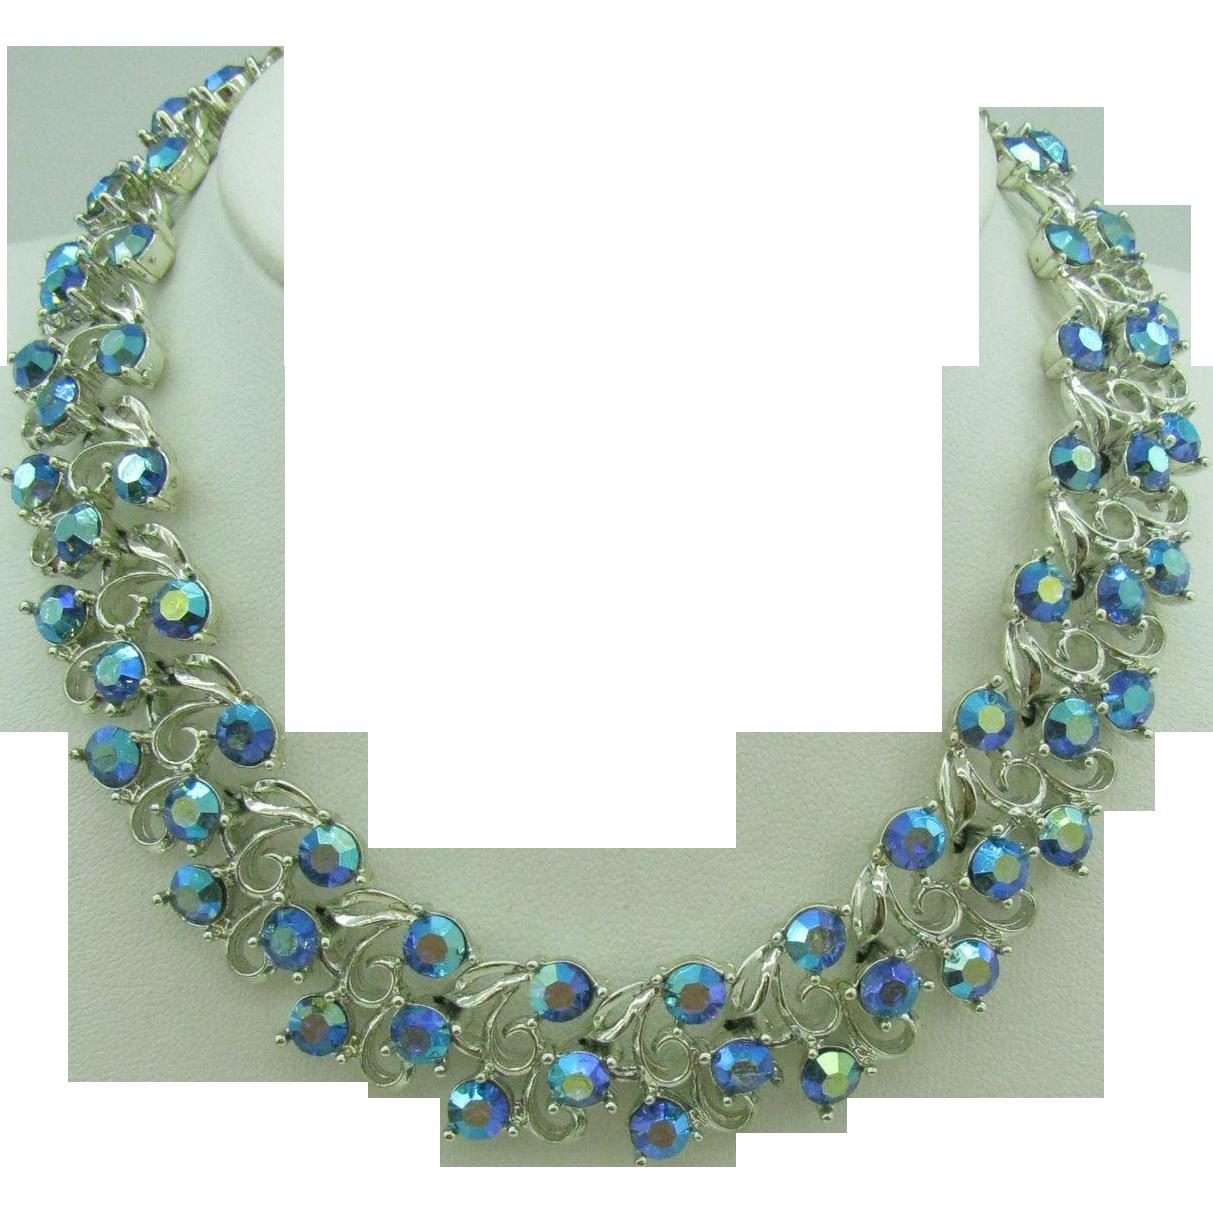 beautiful ab blue rhinestone necklace from eye4jewels on